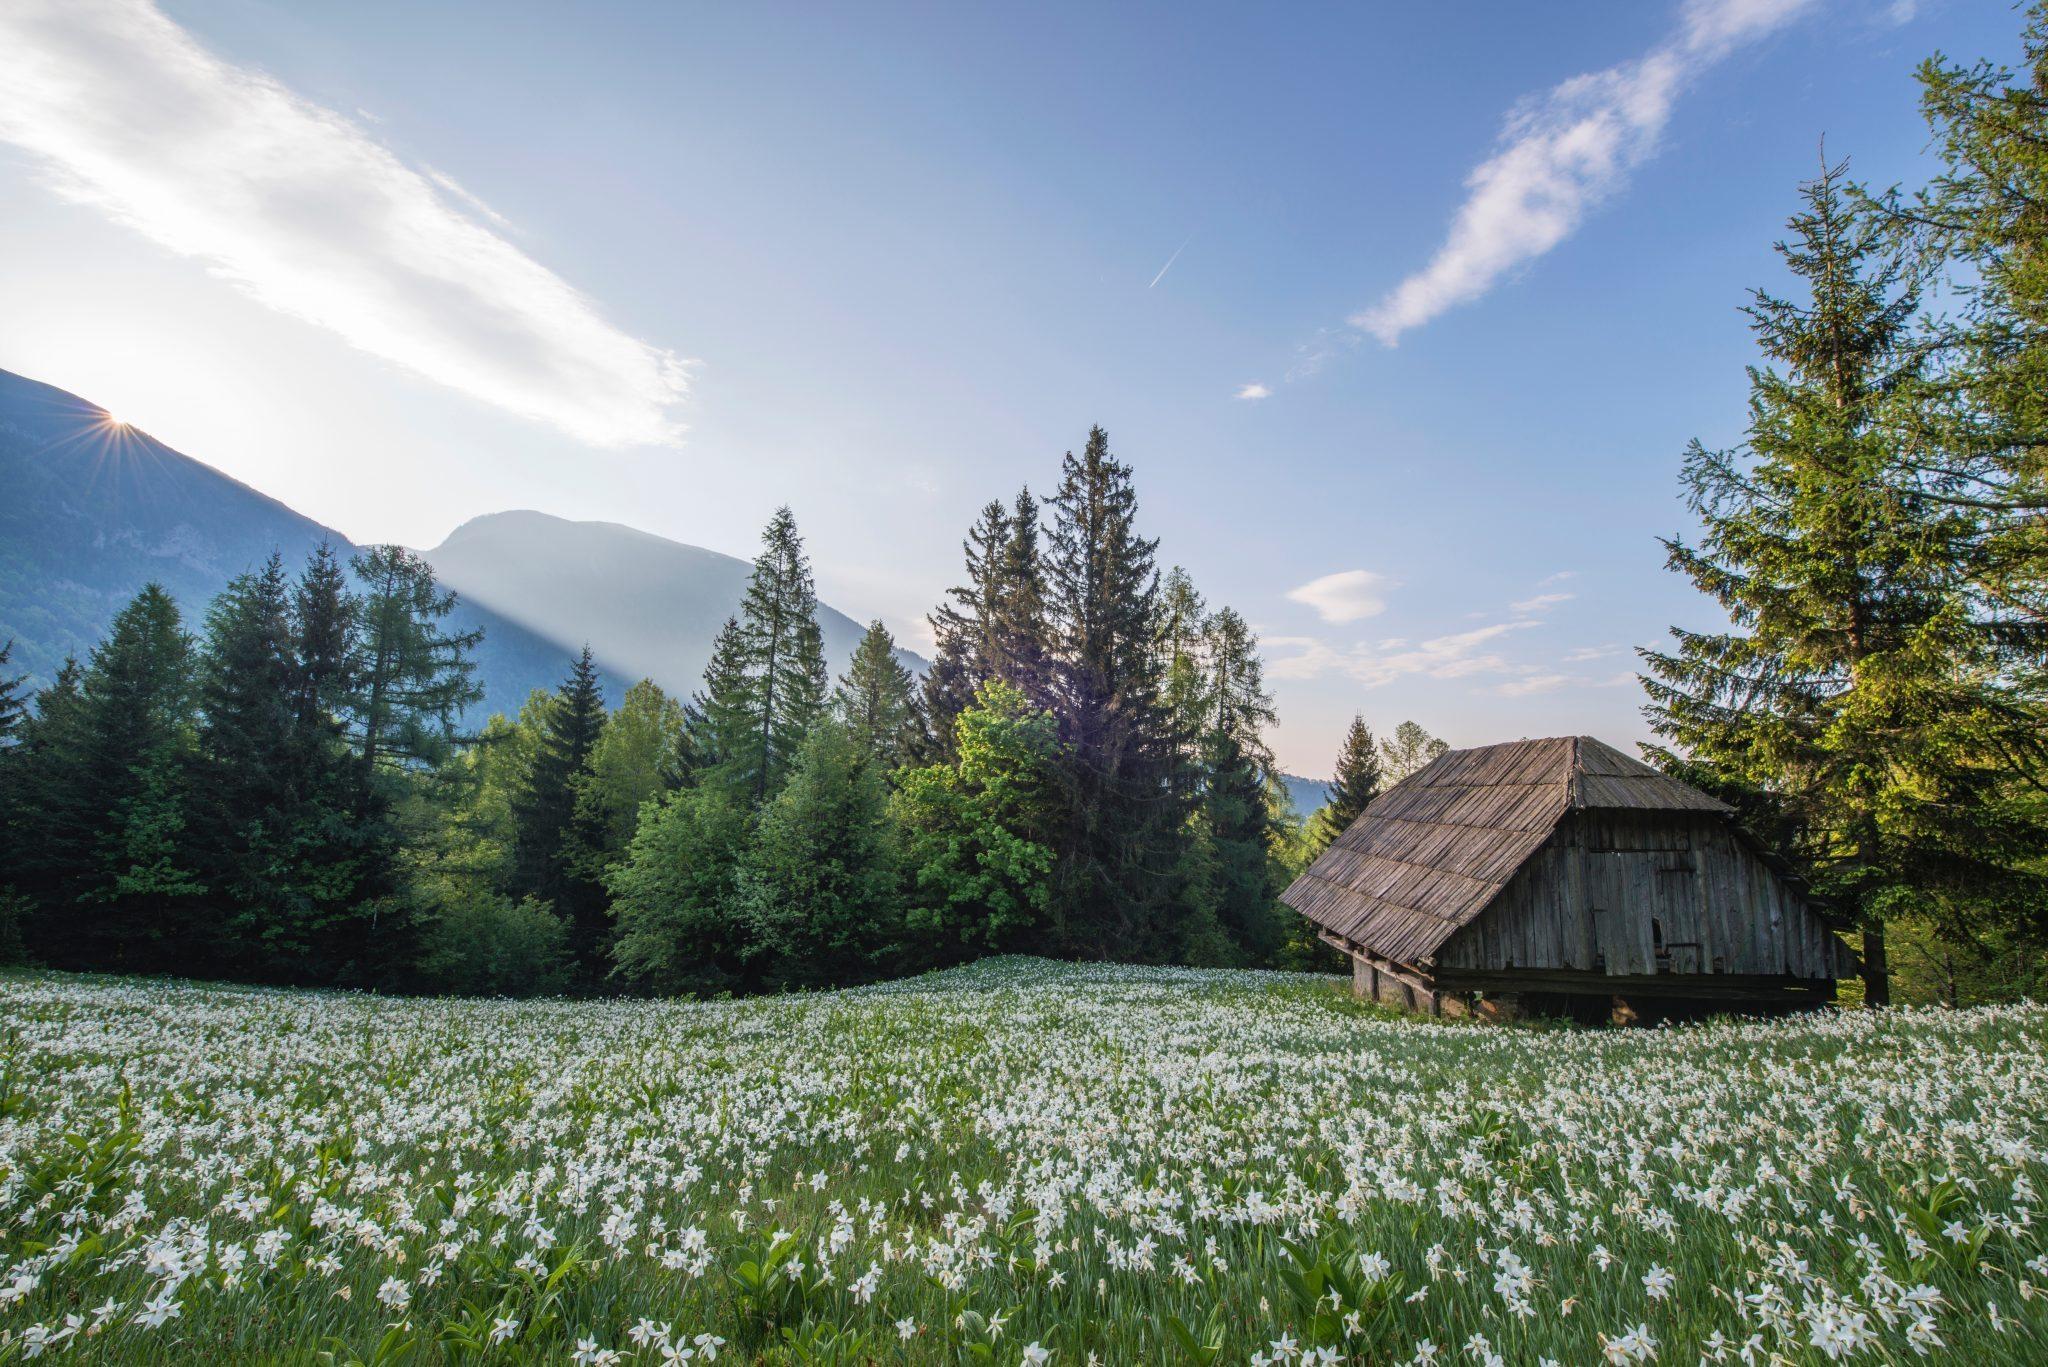 Term Life Insurance Blog